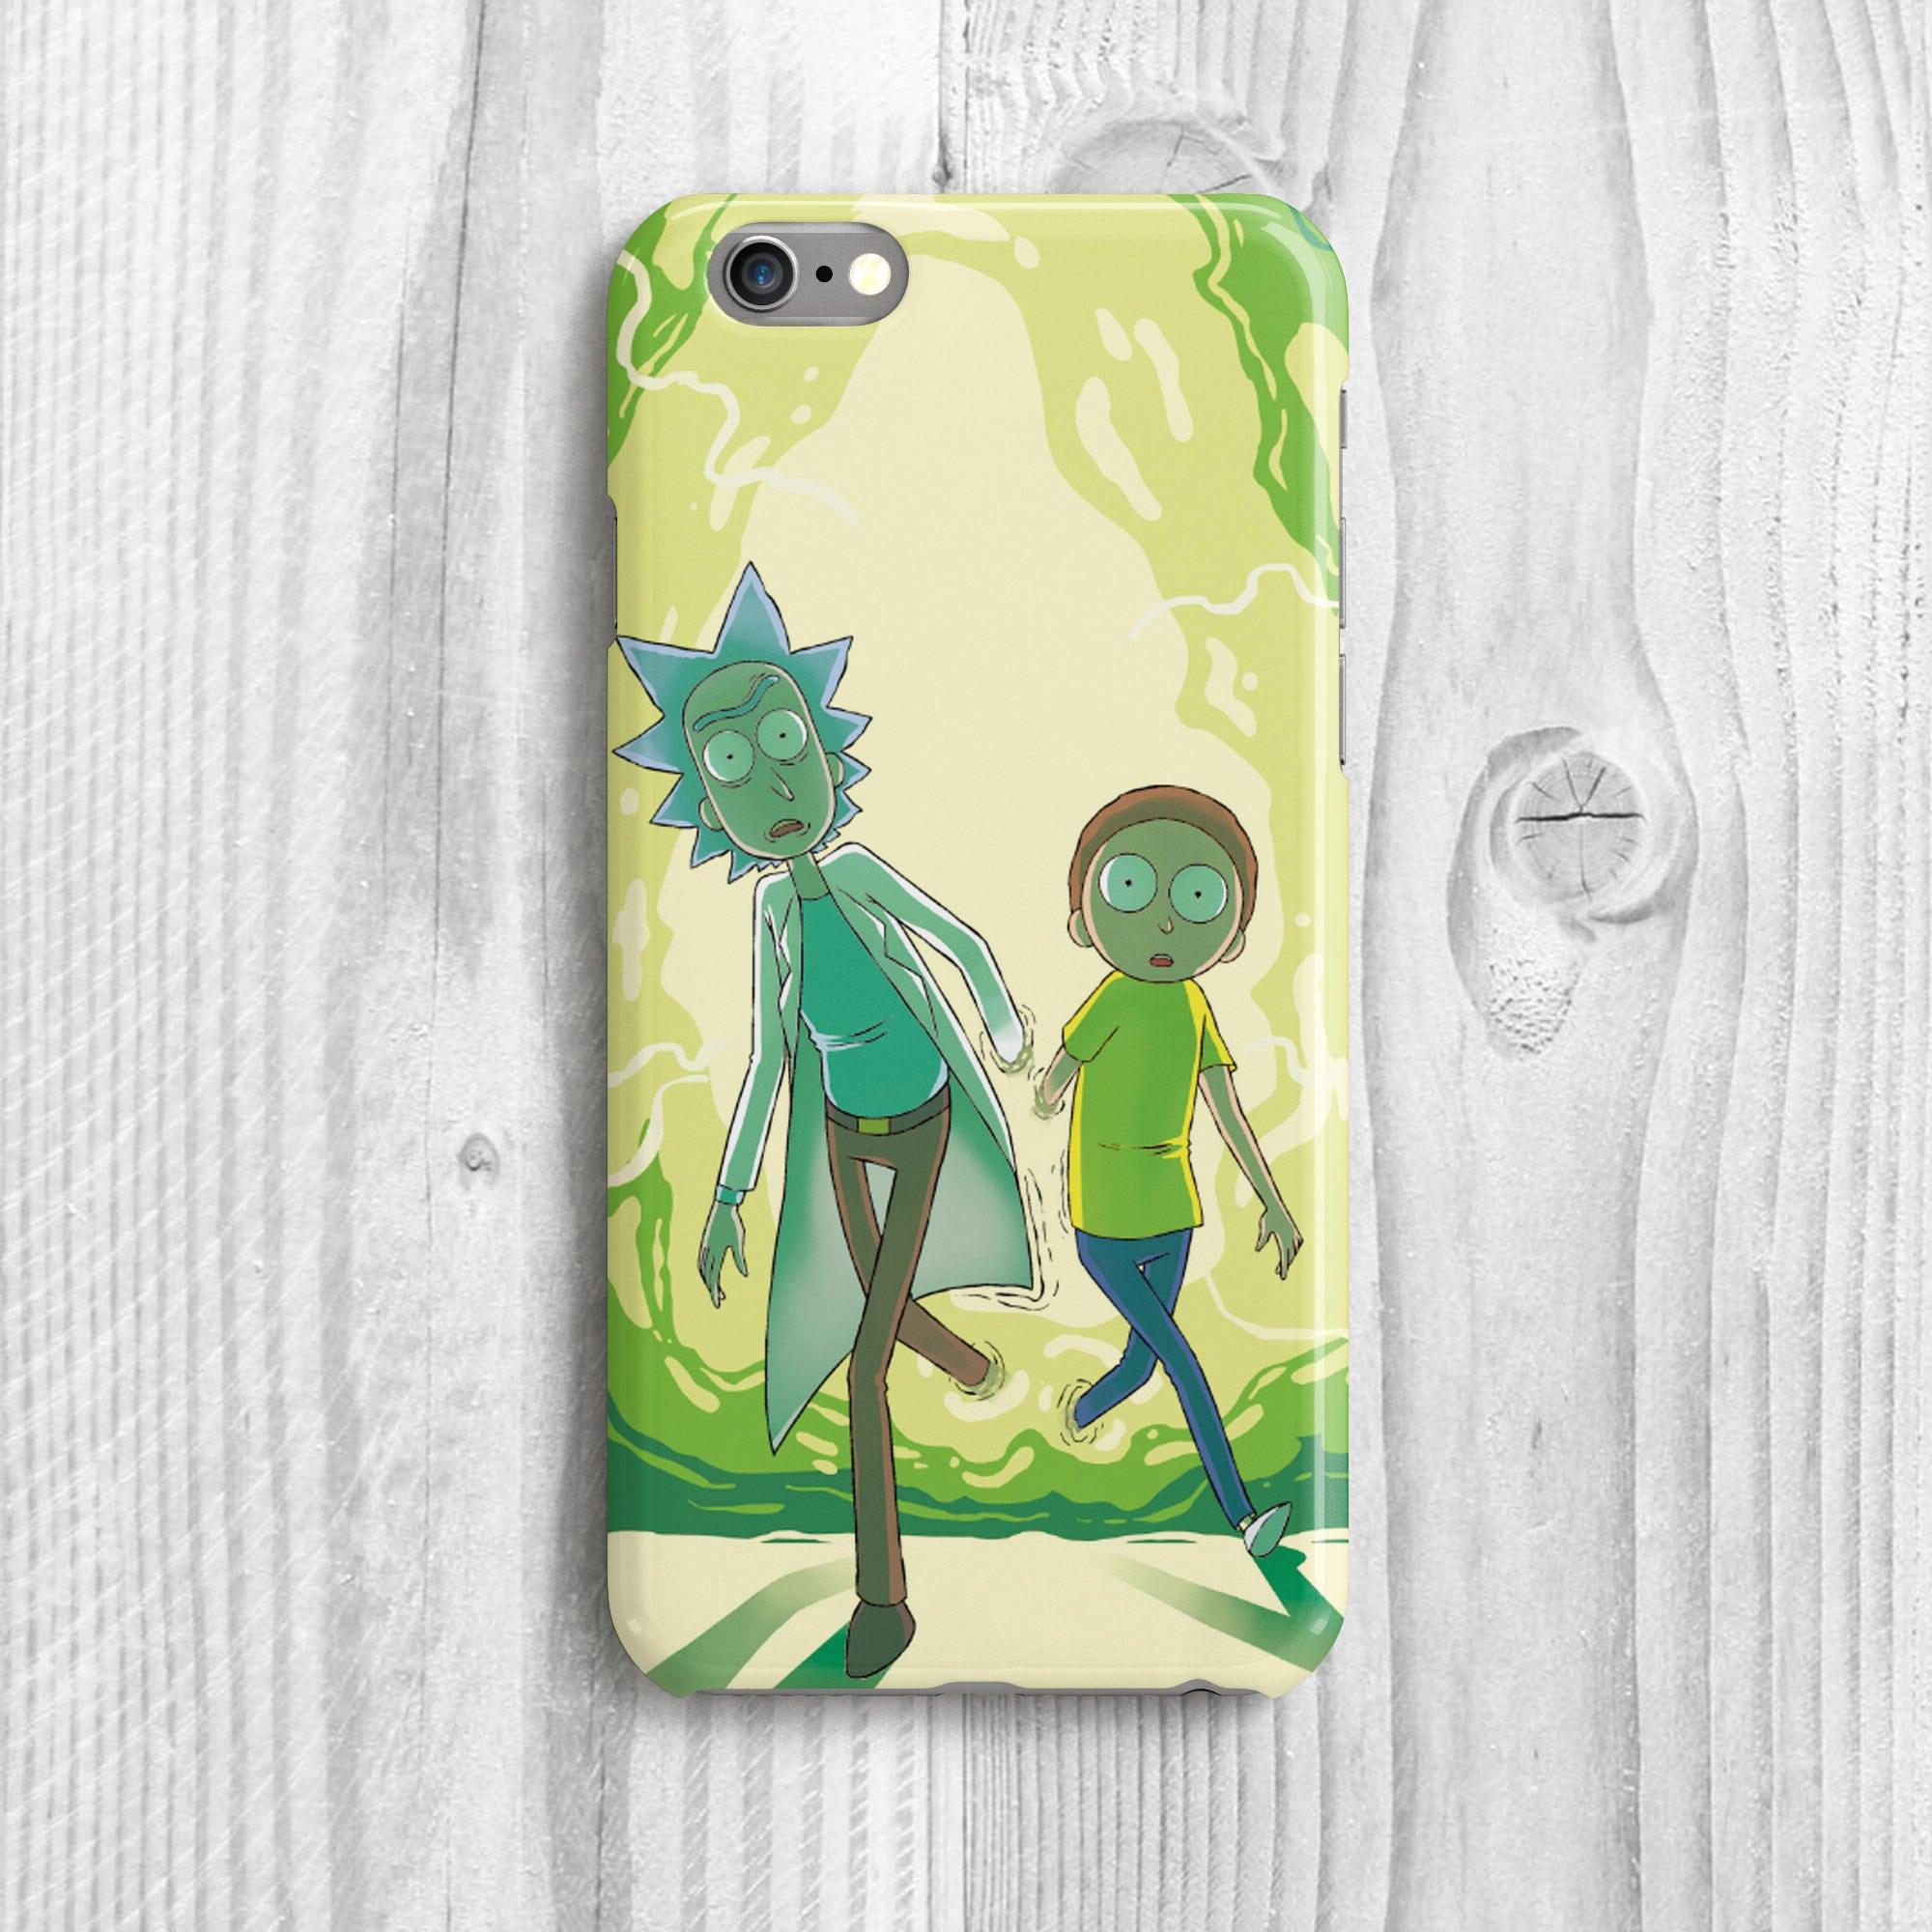 Phone Cases Custom Hardcase Midnight Dots Iphone 4 5 5c 6 Plus 7 Case Mr Meeseeks Rick Morty Samsung S6 S7 S8 Edge 5s